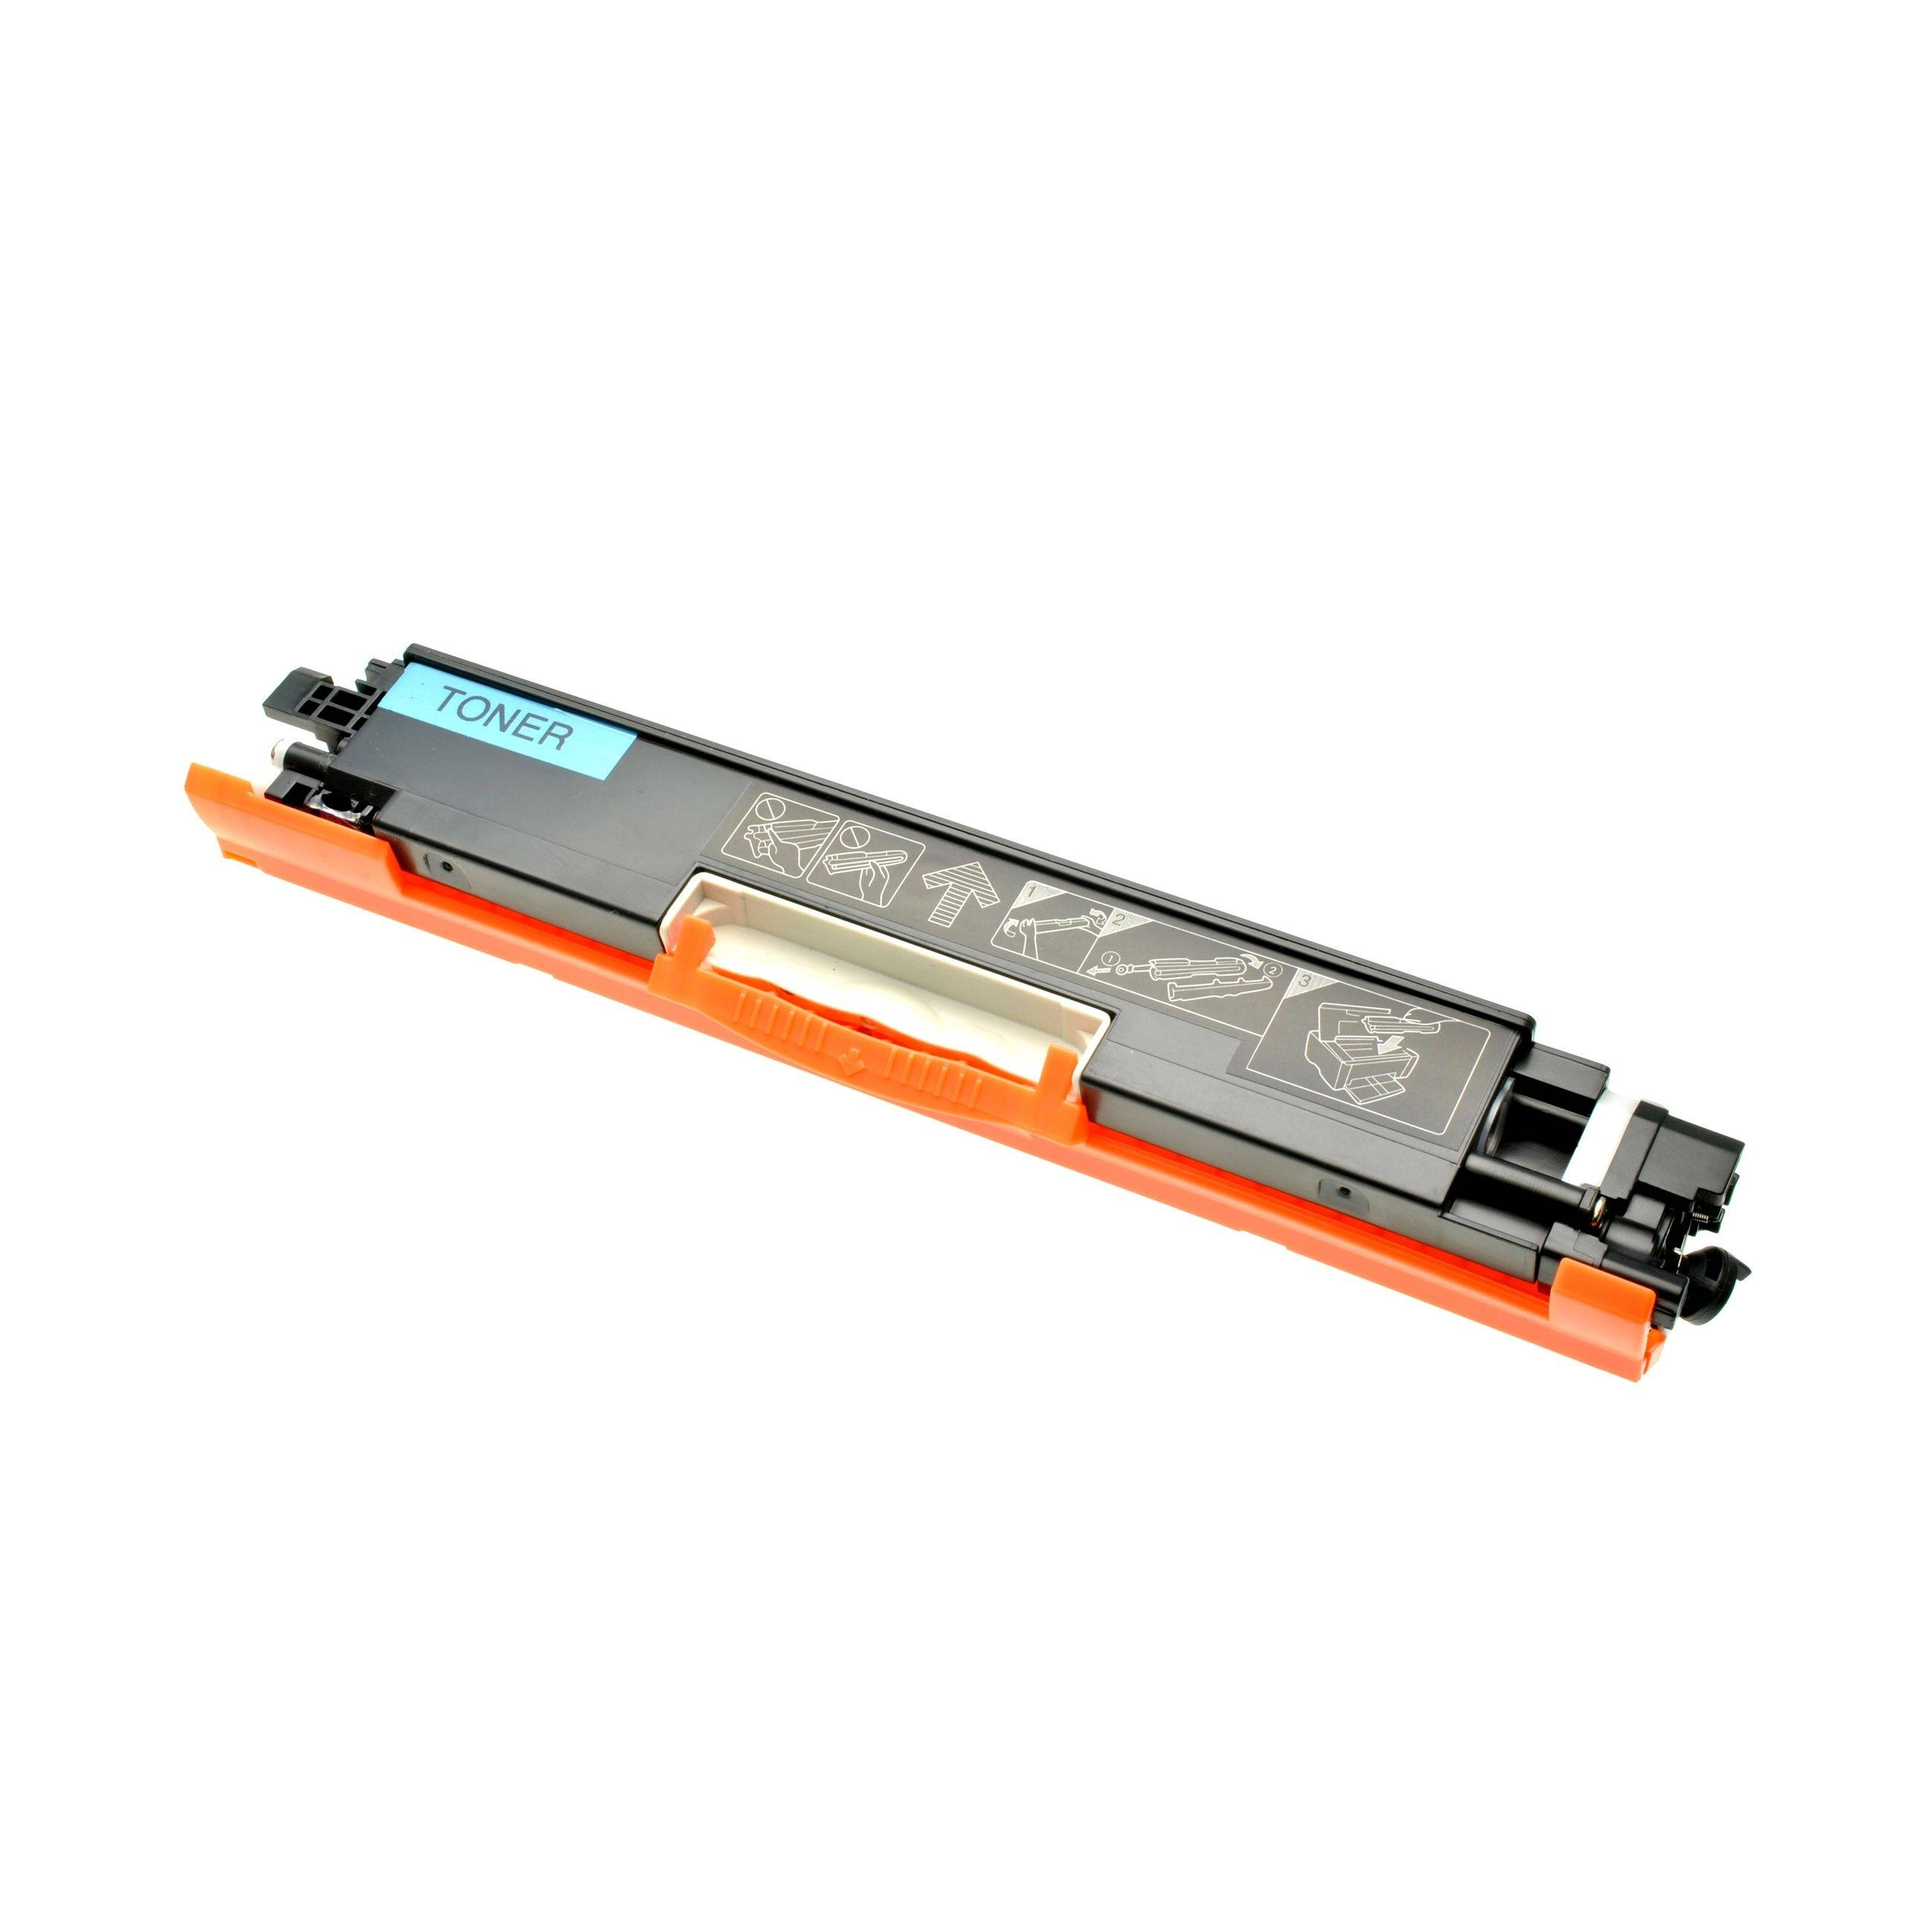 CANON Cartouche de Toner pour CANON 4369B002 / 729 C cyan compatible (de marque ASC)